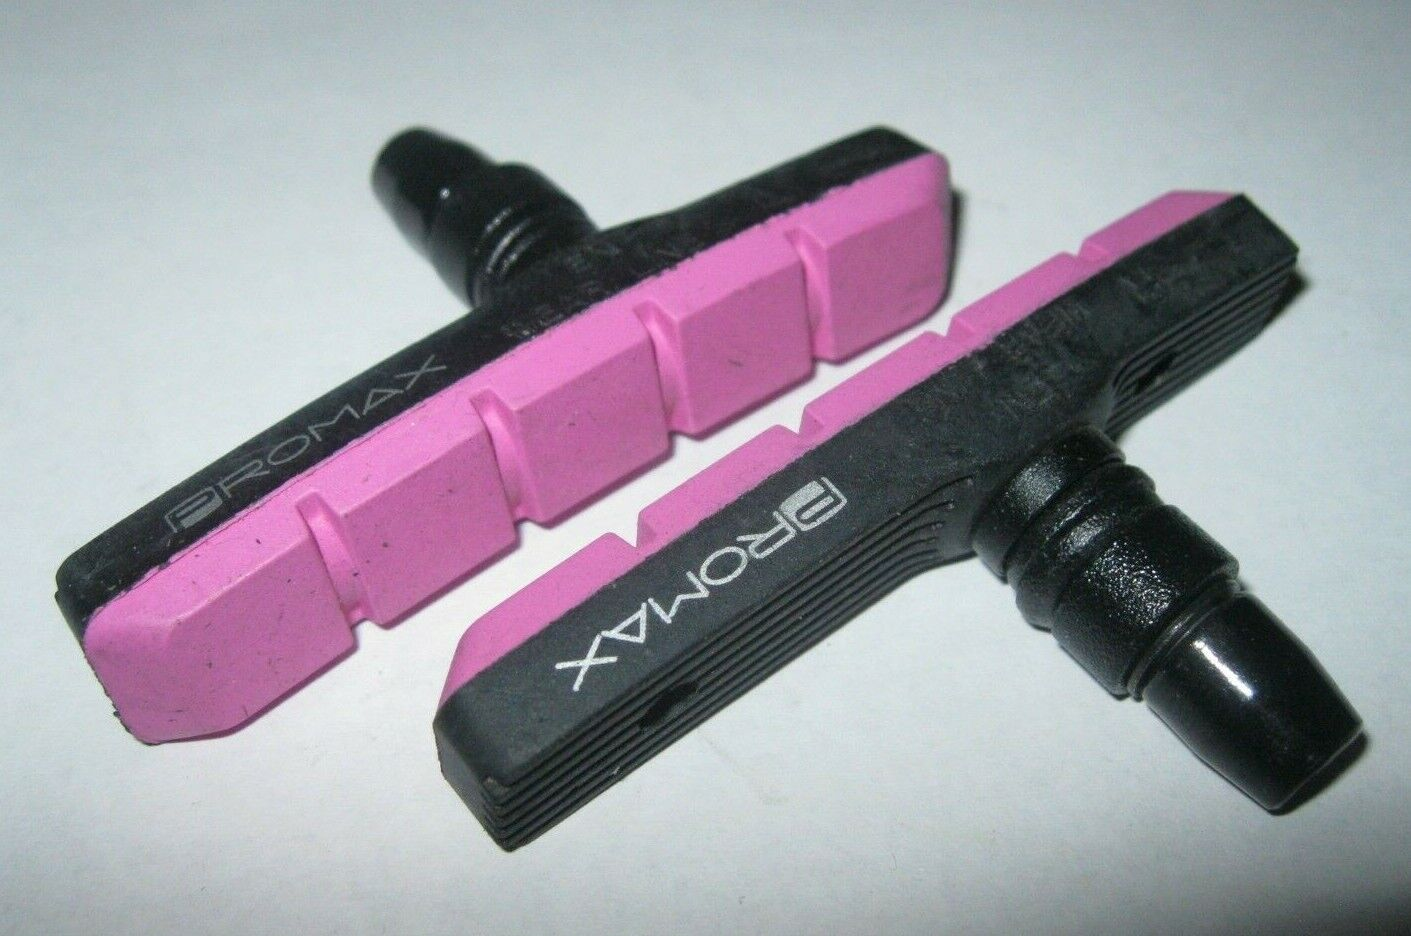 Promax B-1 Cartridge Brake Pad Replacement Inserts 70mm Pink